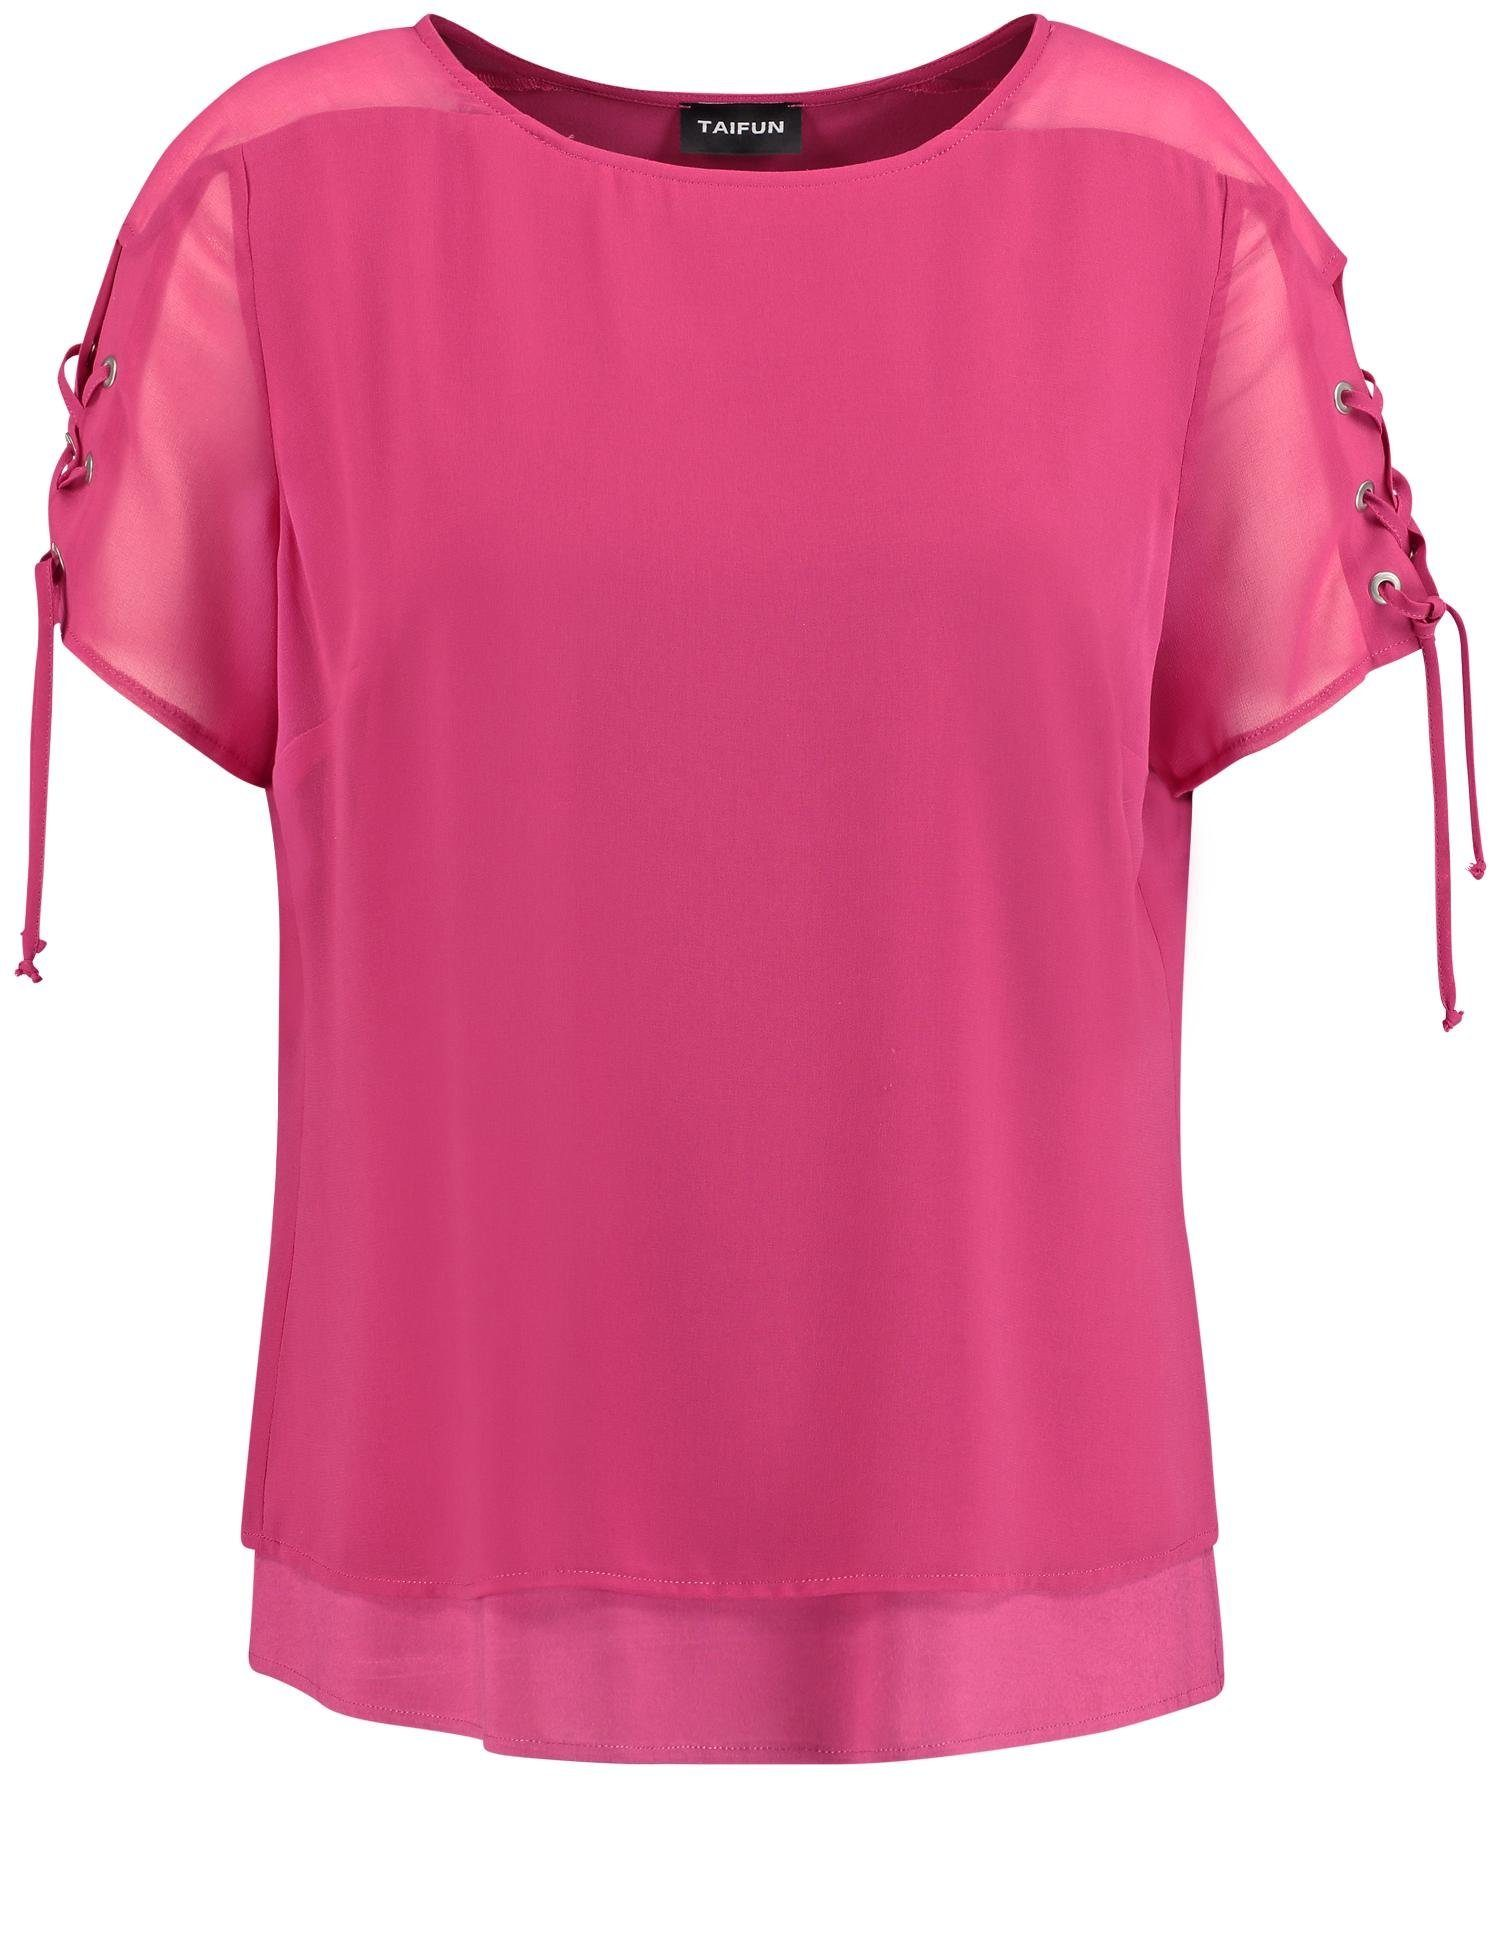 TAIFUN Bluse Kurzarm Layer-Bluse mit Schnürung am Arm